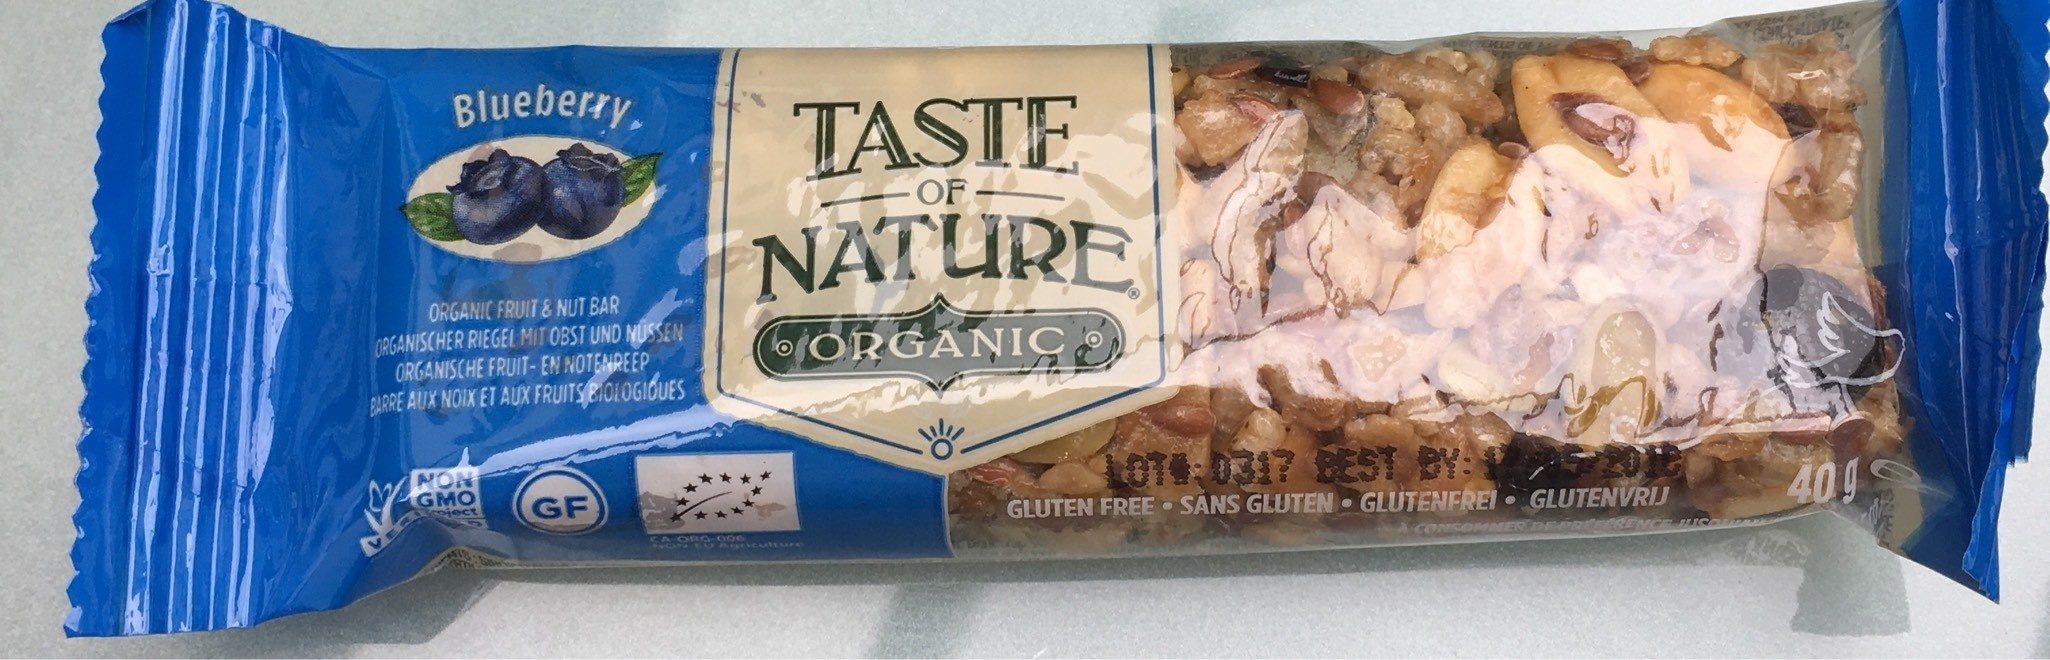 Taste Of Nature - Blueberry Granenreep - Product - fr